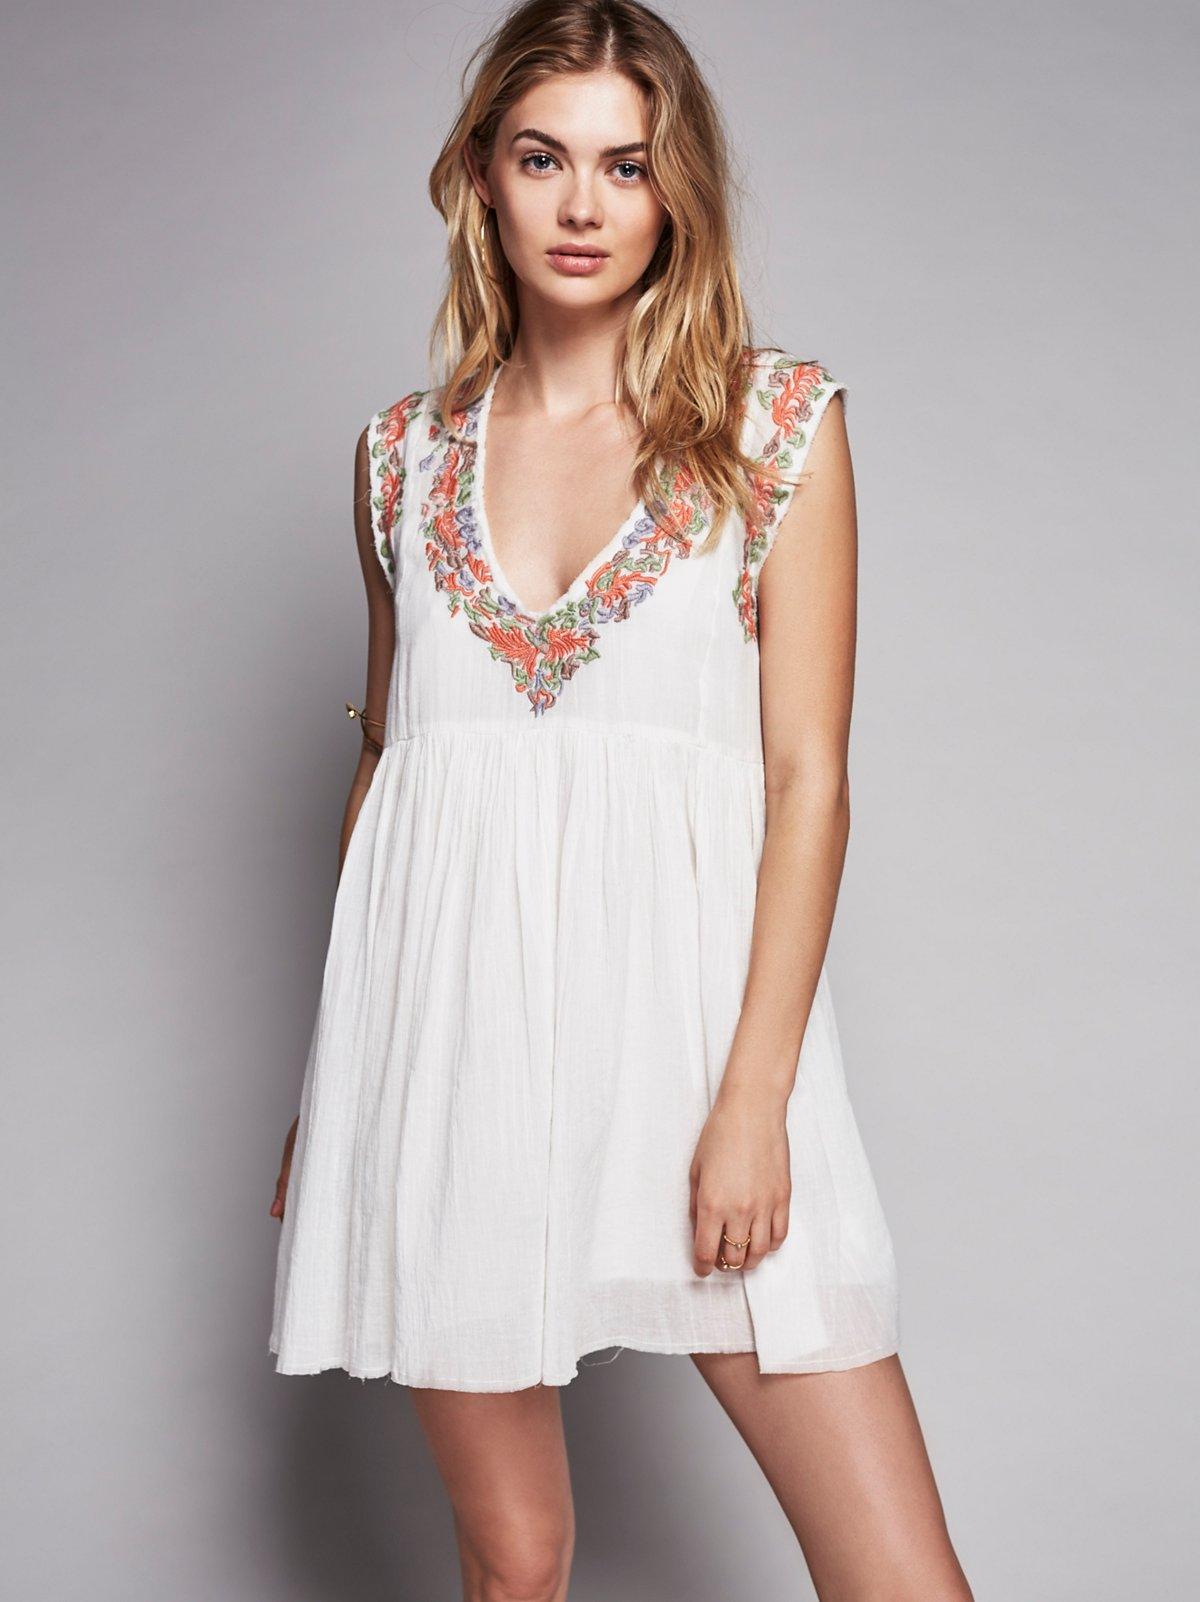 FP ONE Modern Mexico连衣裙